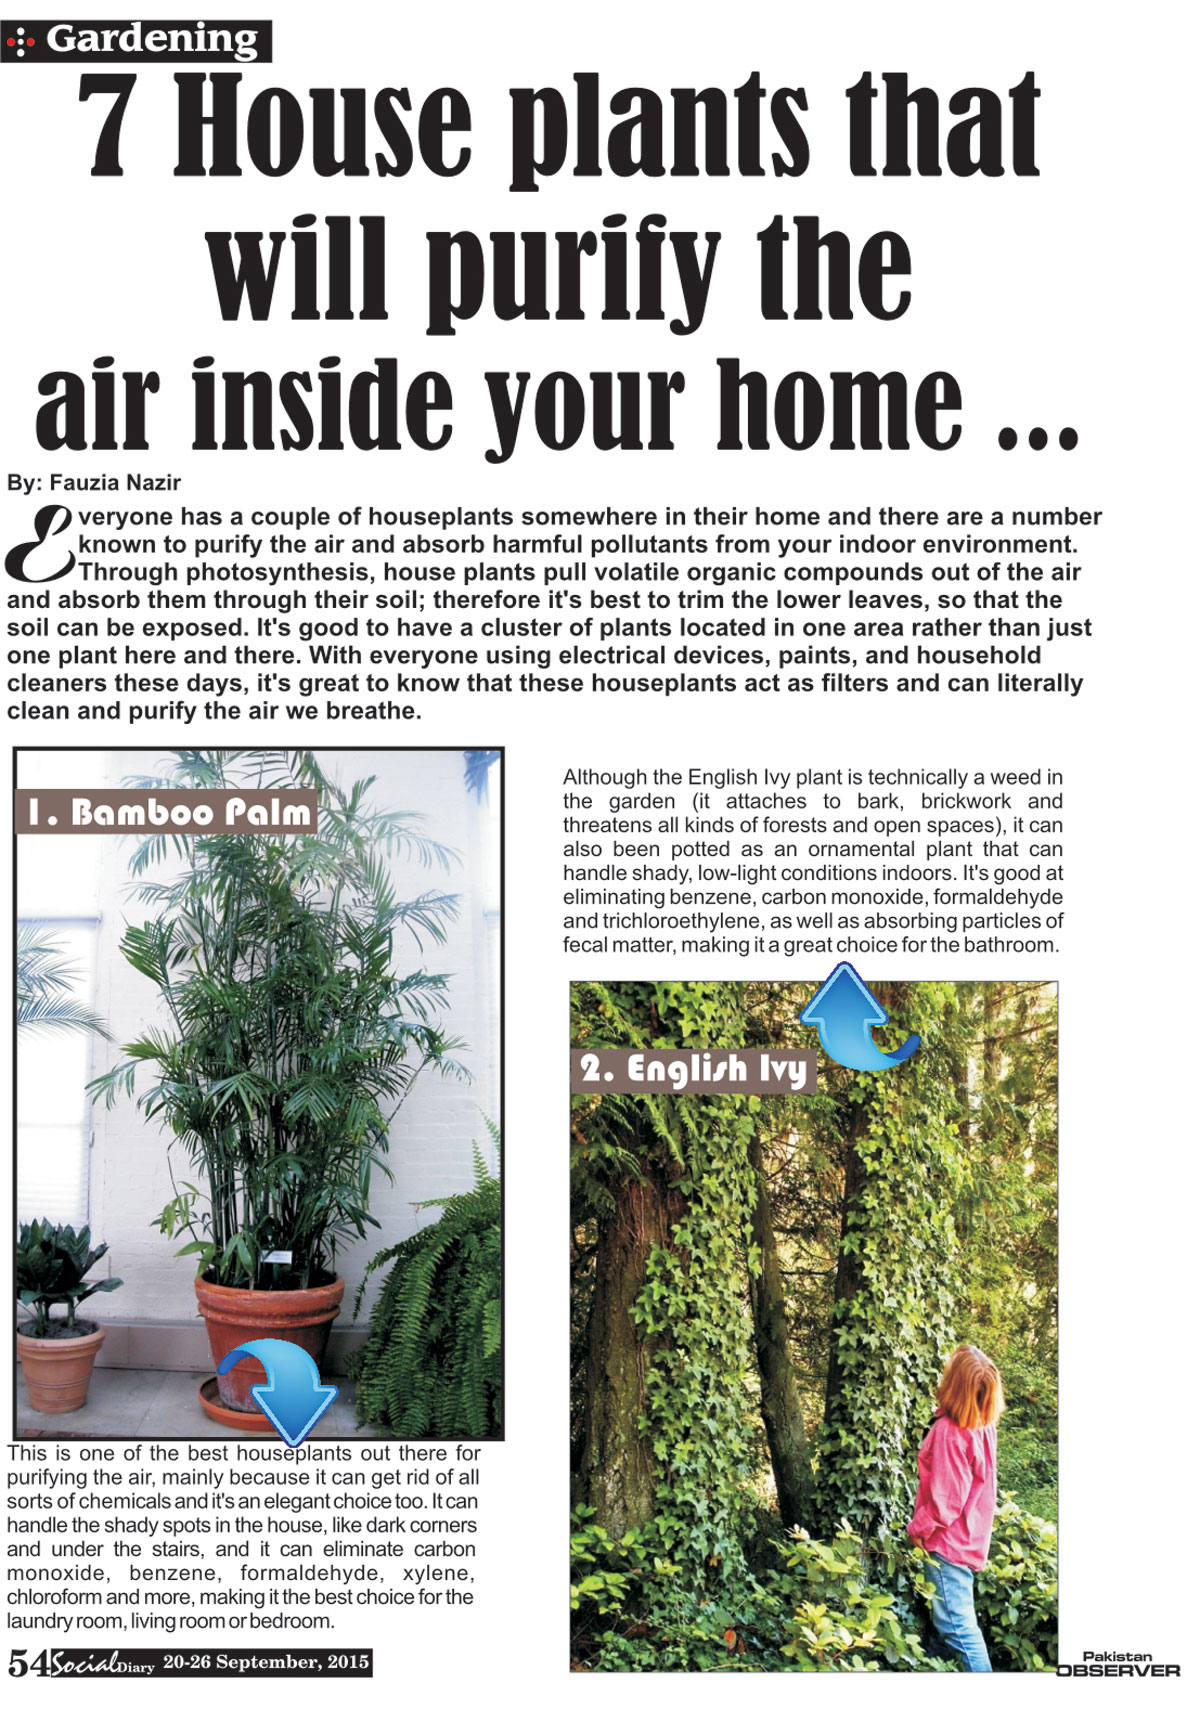 Home plants in pakistani